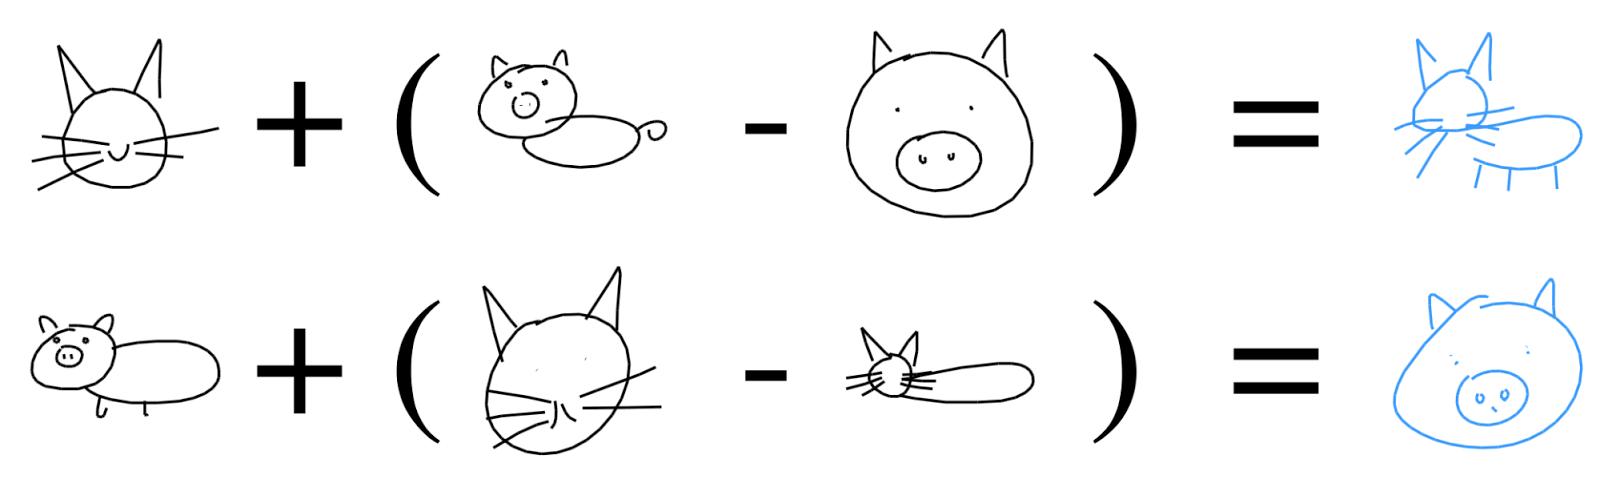 Google AI Blog: Teaching Machines to Draw